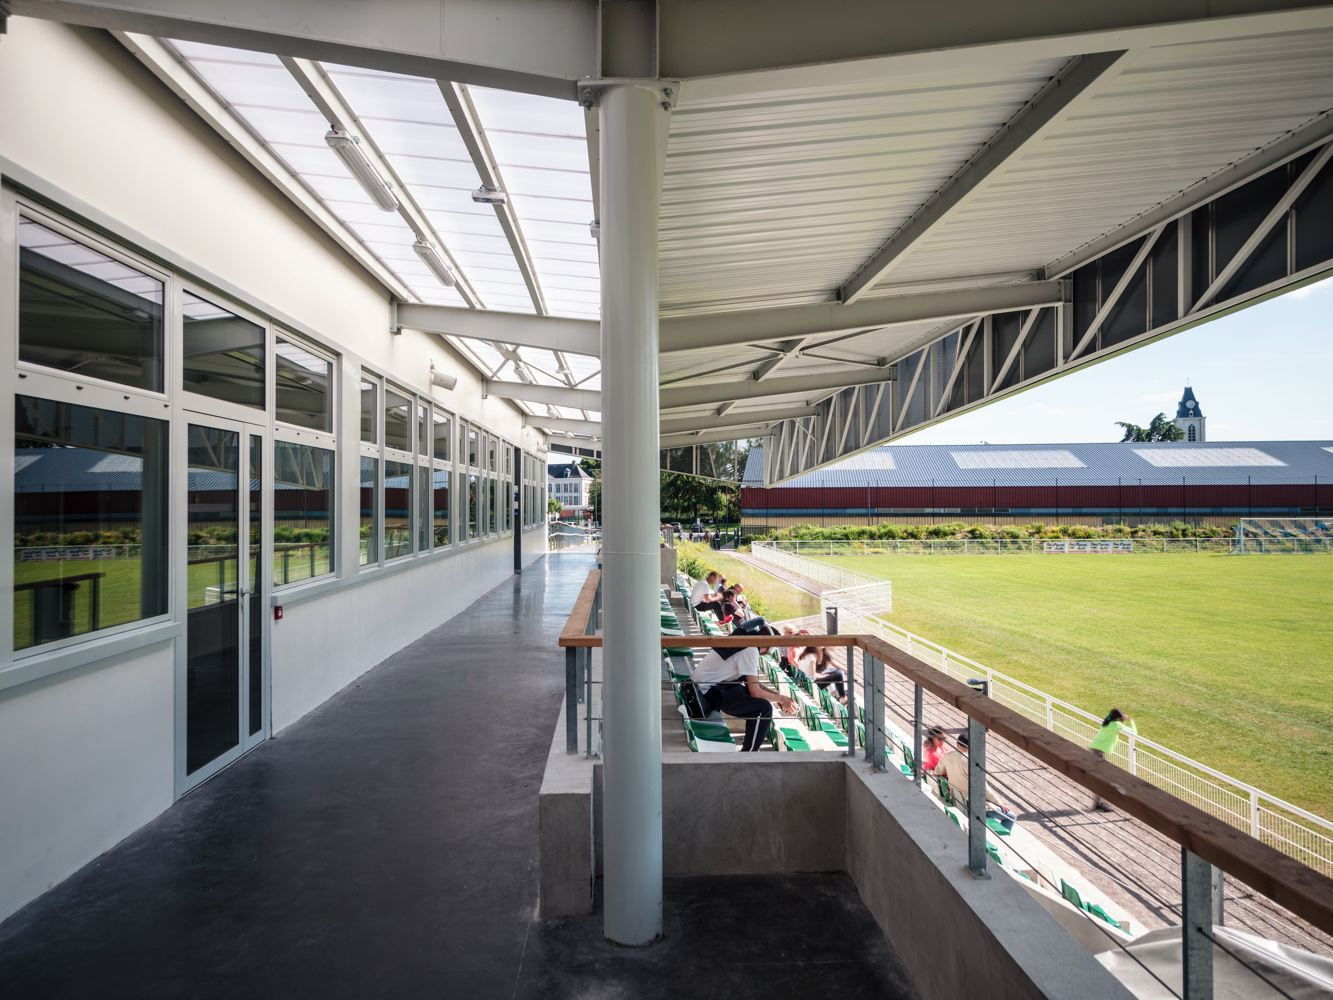 LDKphoto-EFarchi-Stade-Jean-Jacques-024.jpg